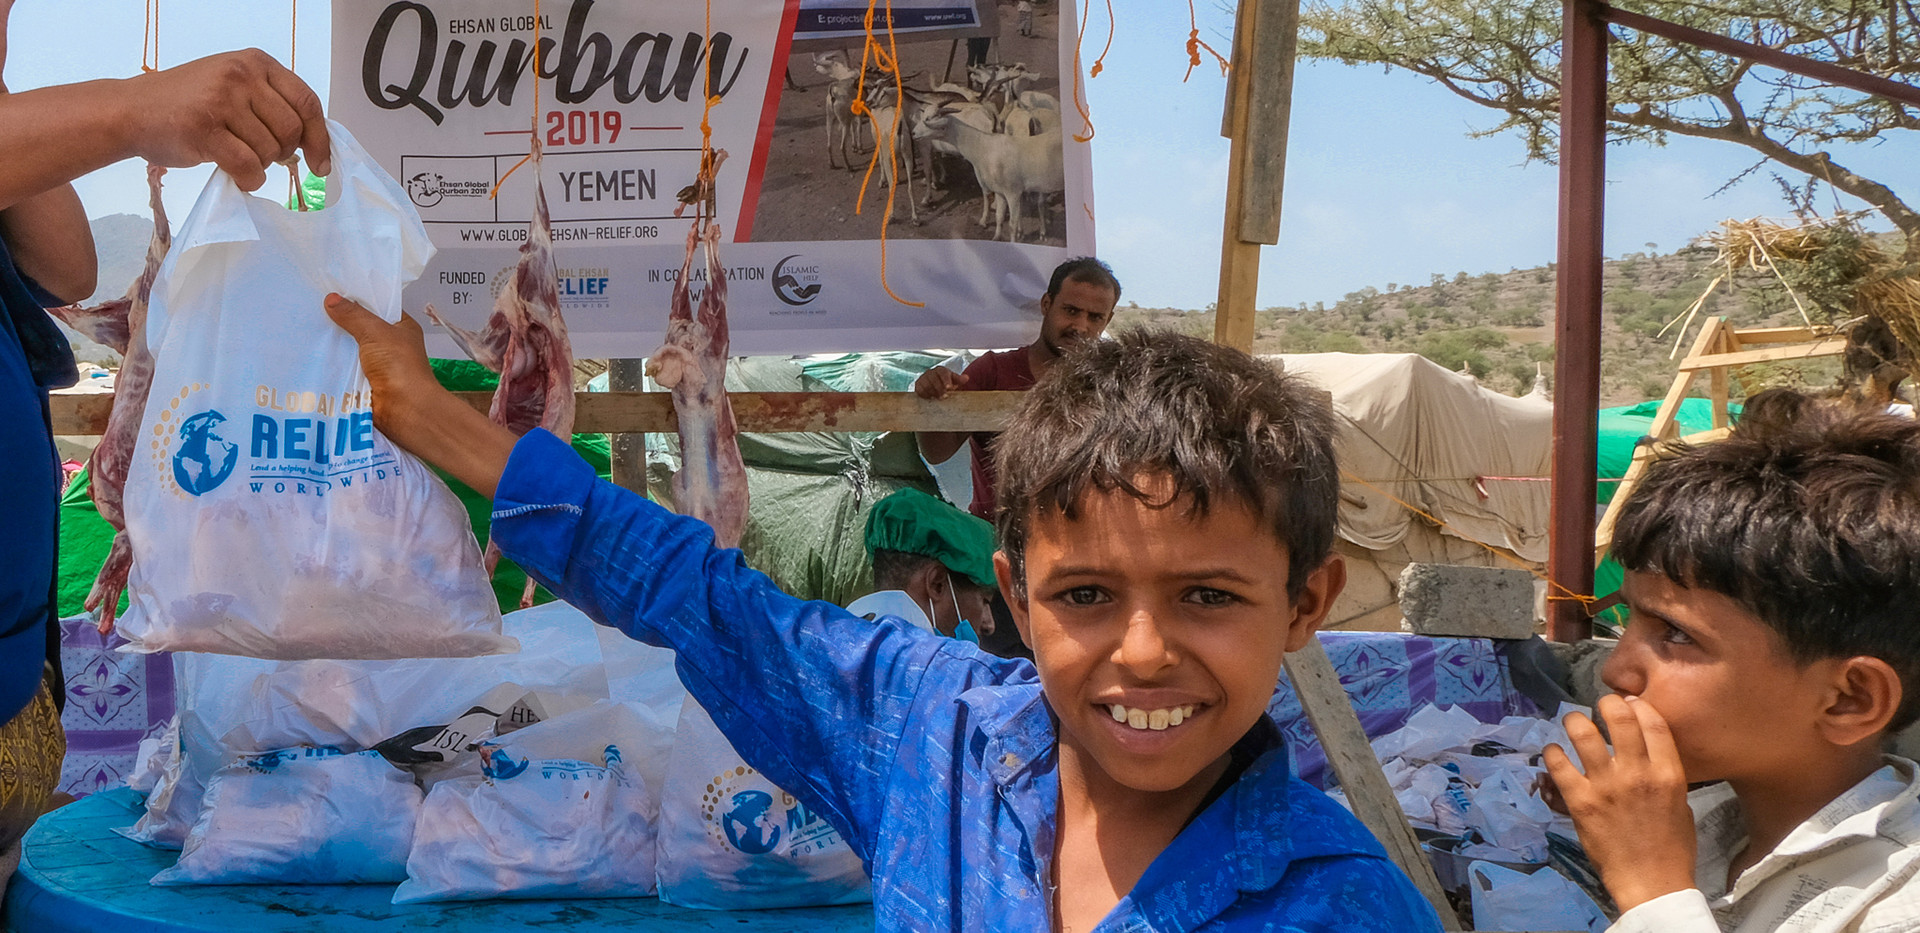 Qurban in Yemen 2019